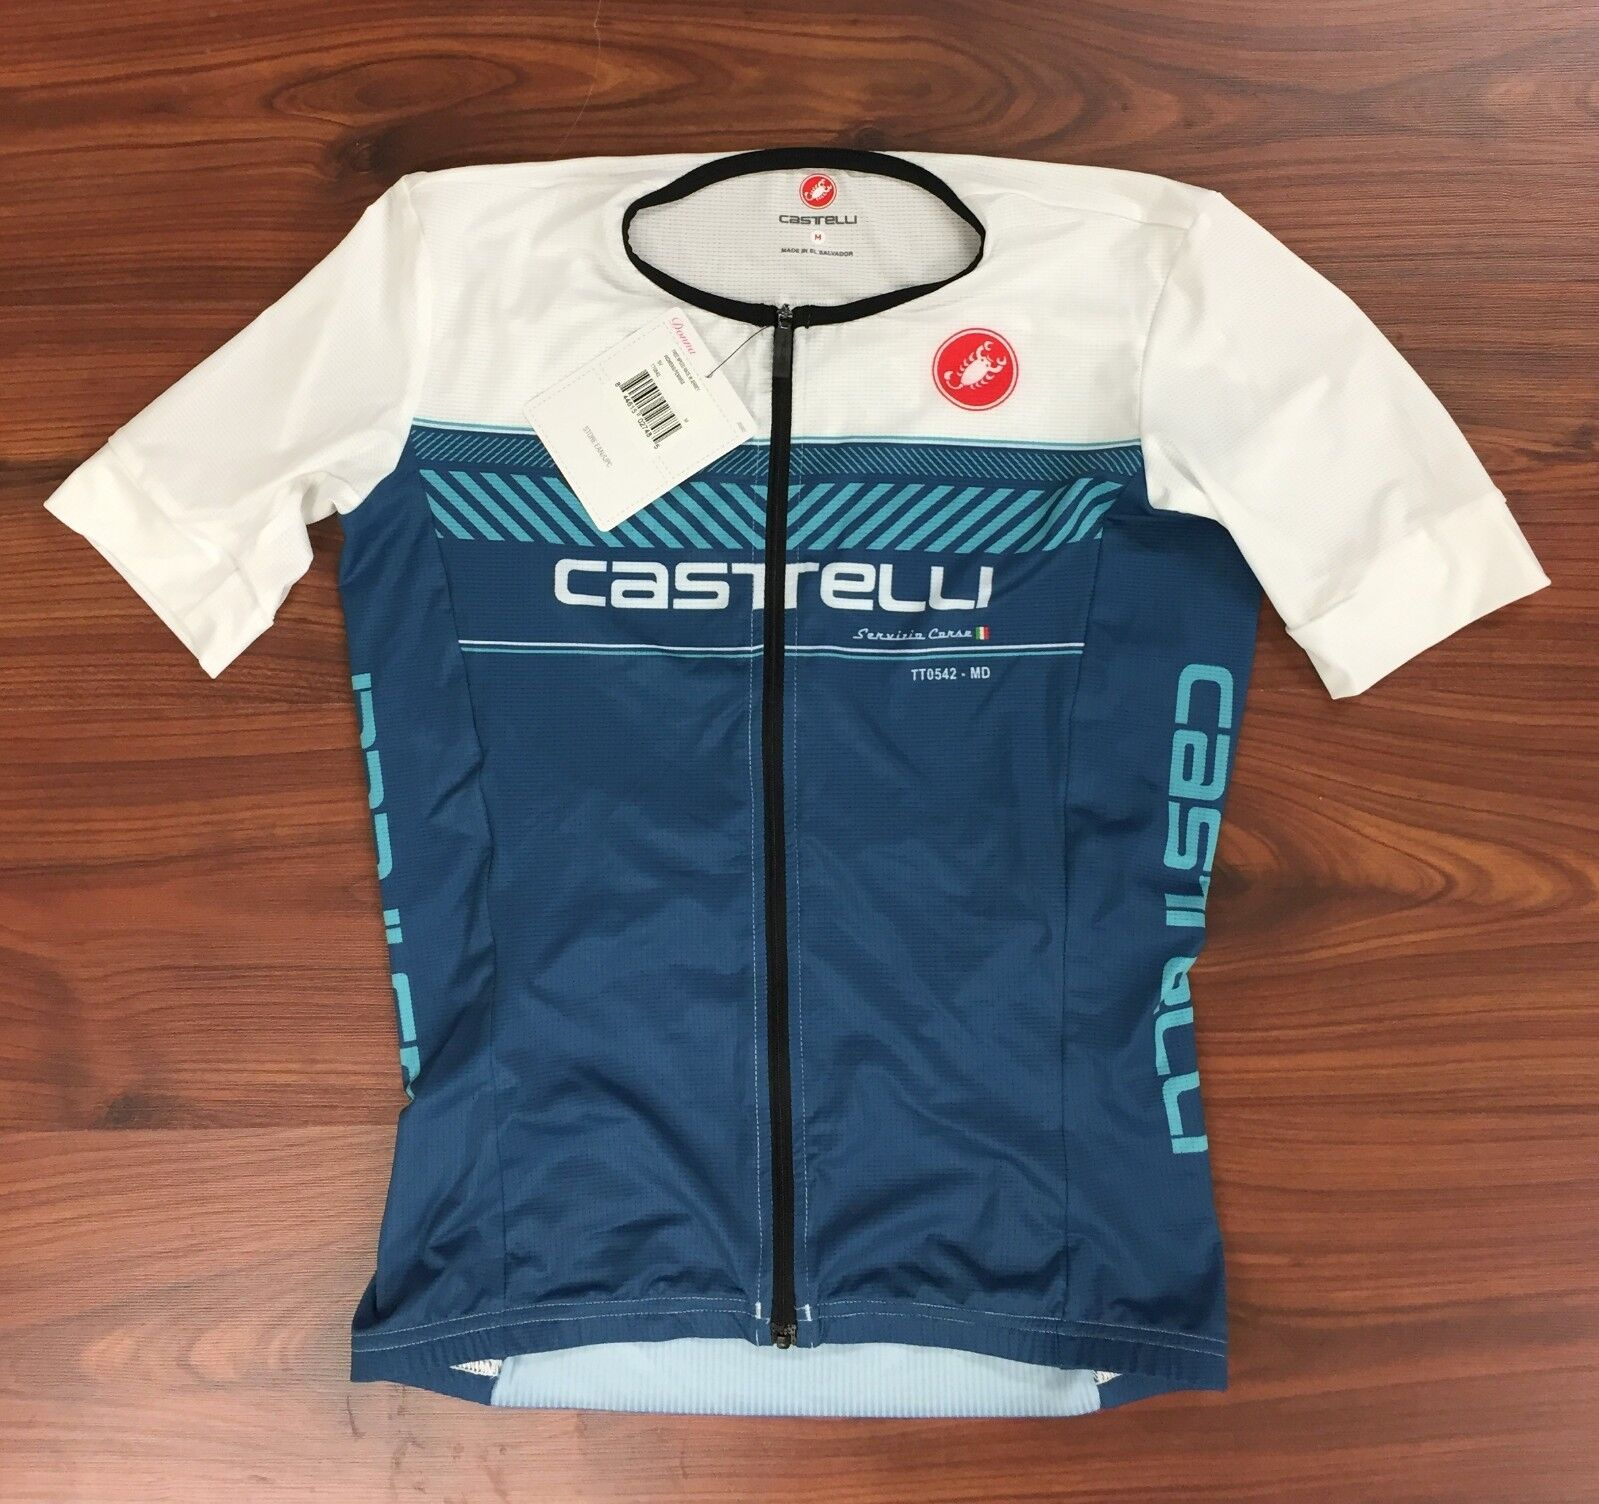 Castelli Gratis Speed Race Vrouwen Medium Jersey nieuwe met tags